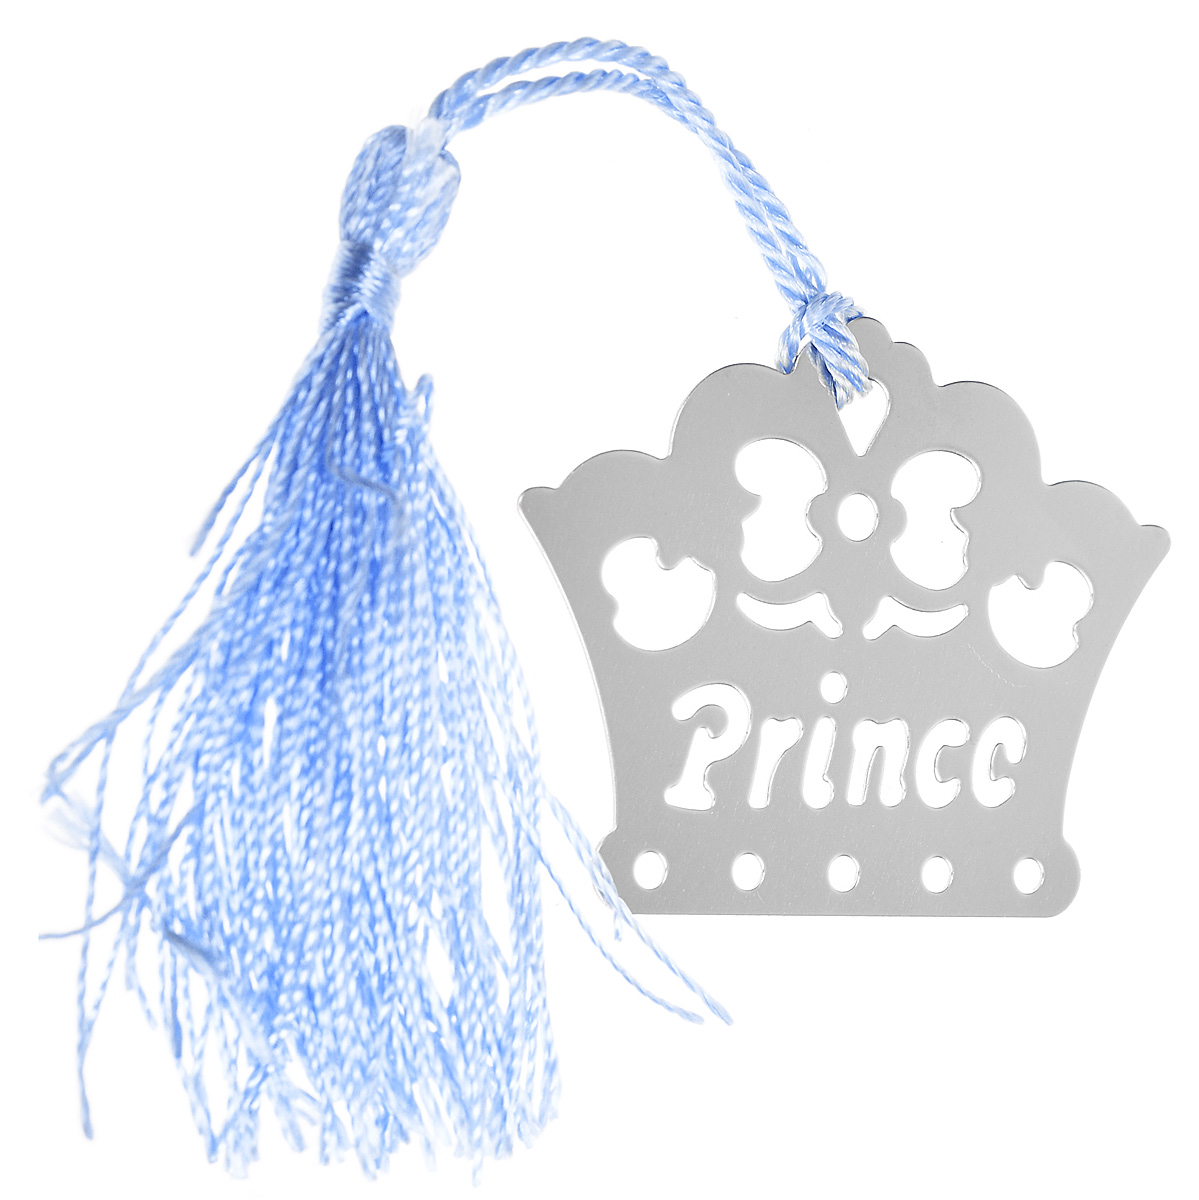 Magic Home Закладка для книг Корона Принц magic home закладка для книг 75693